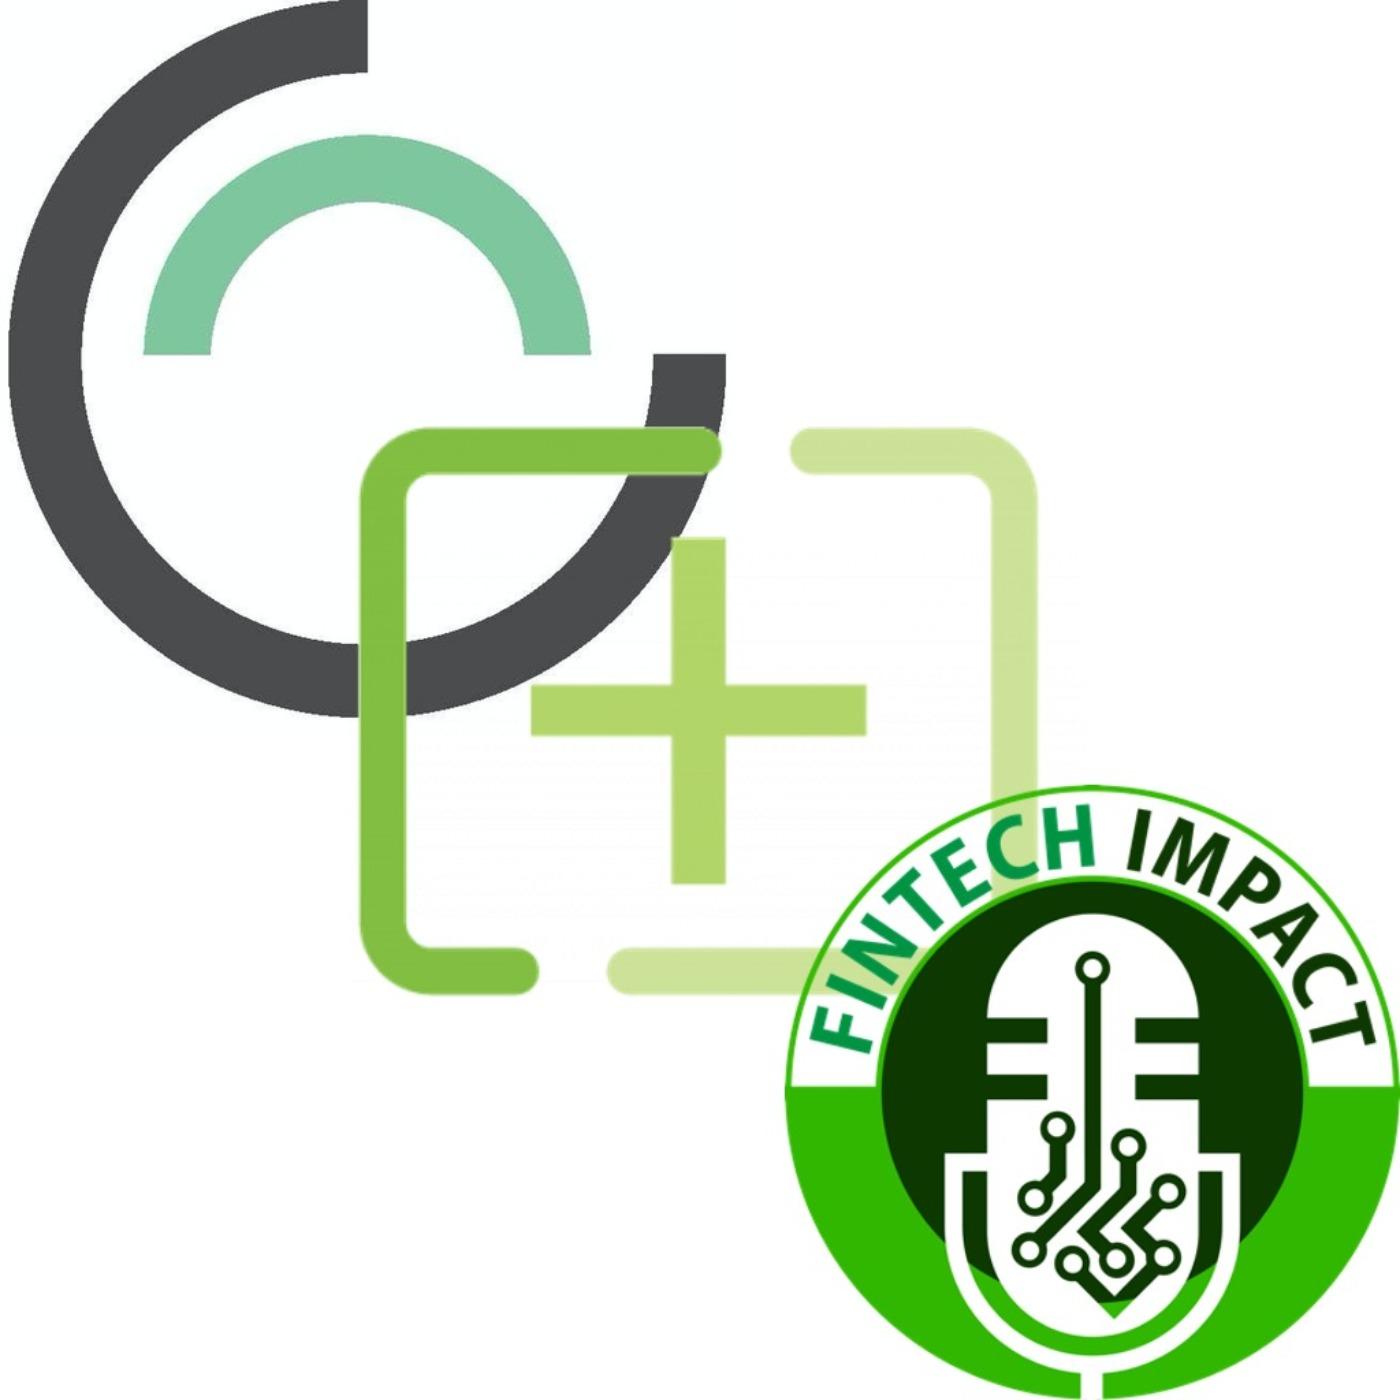 Nest Wealth & Razor Plan with Randy Cass (CEO) & David Faulkner (Head of Research) | E92